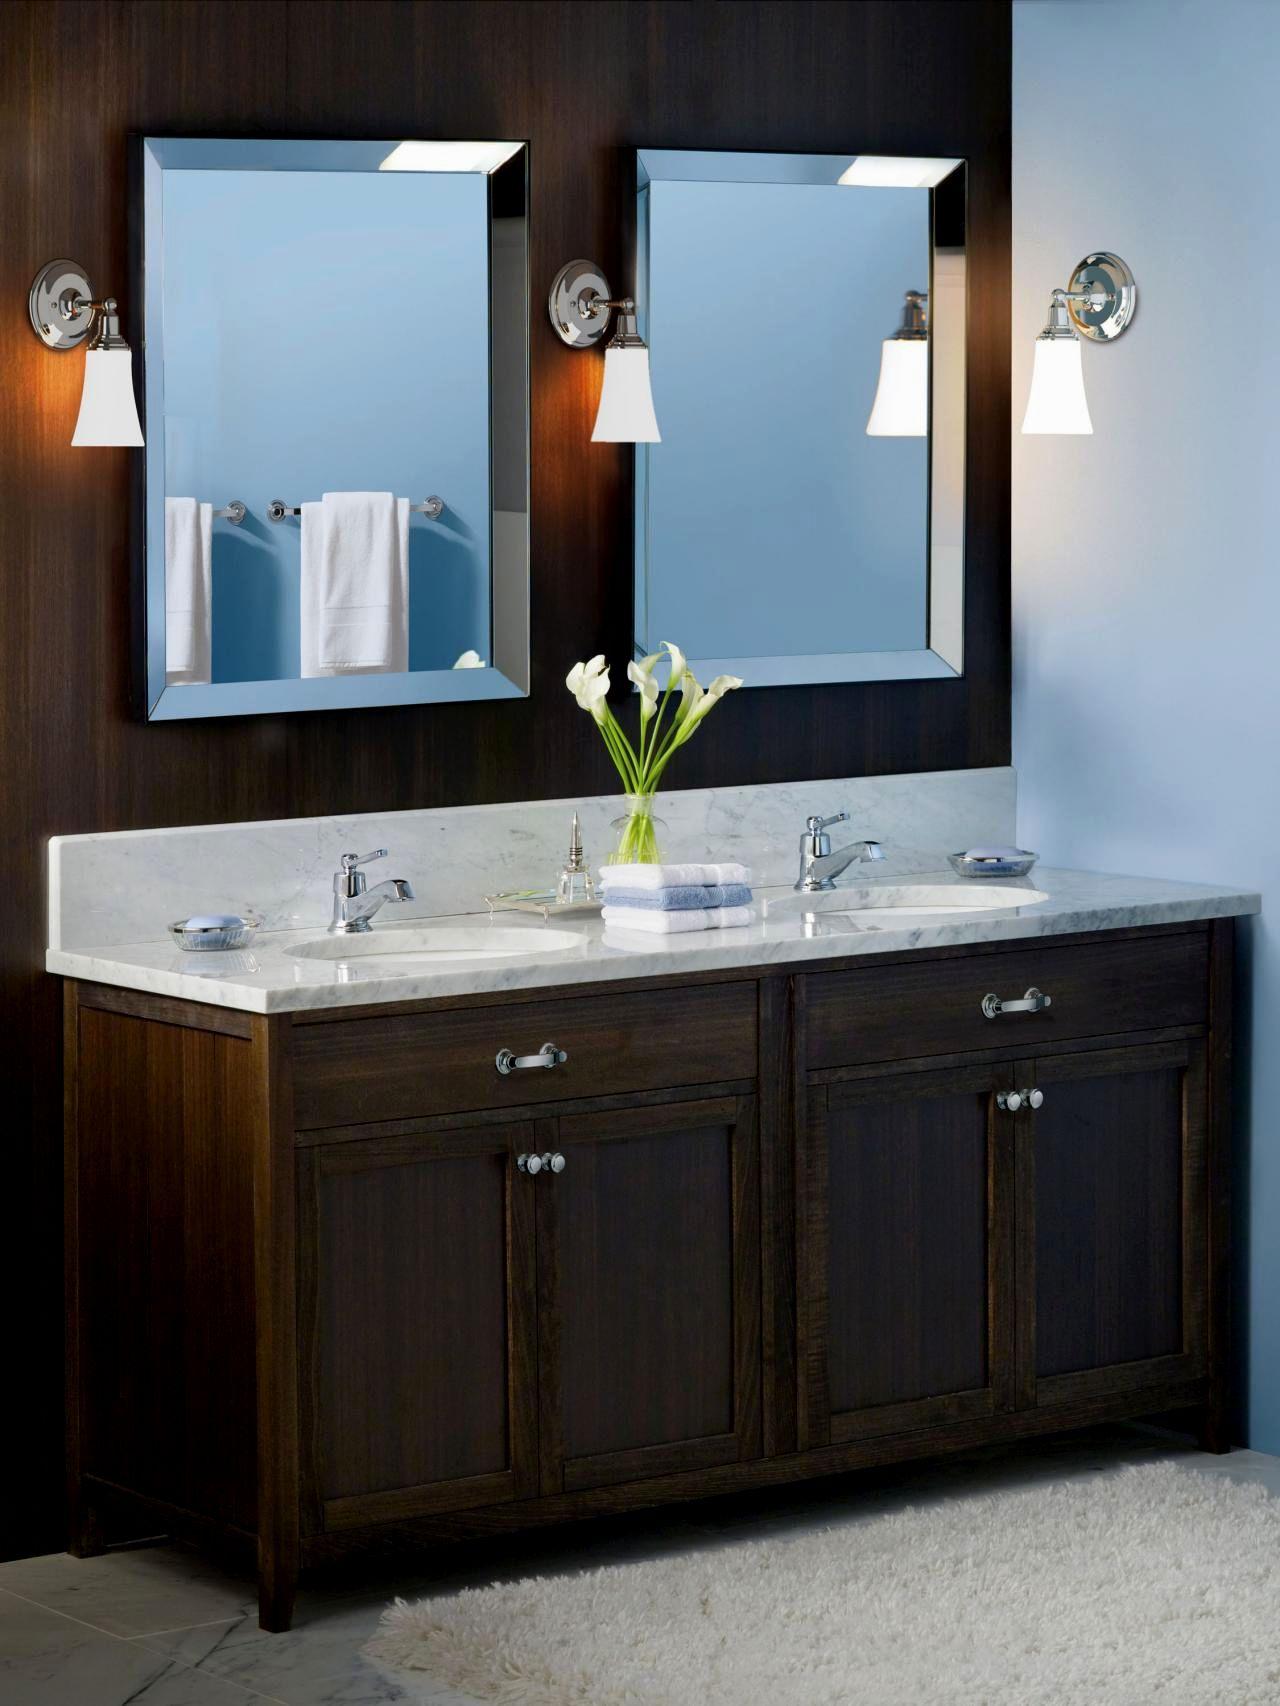 modern mirror in the bathroom plan-Lovely Mirror In the Bathroom Model